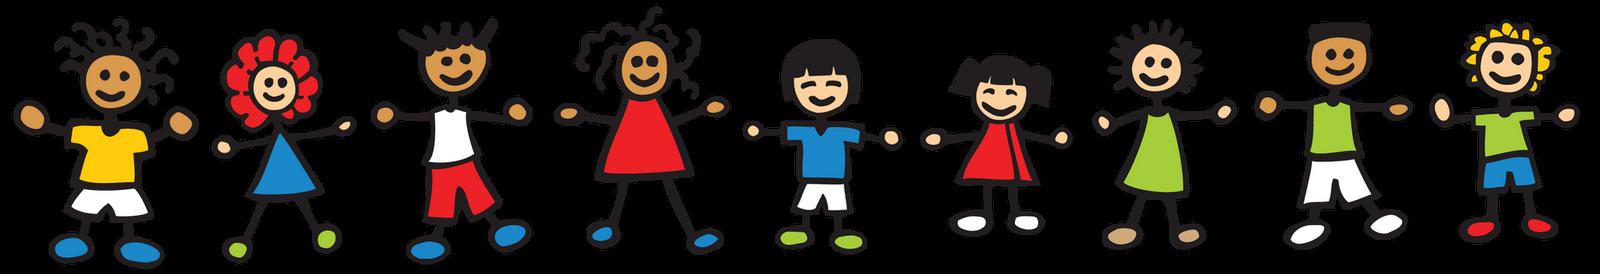 Preschool clipart children's. School children transparent png